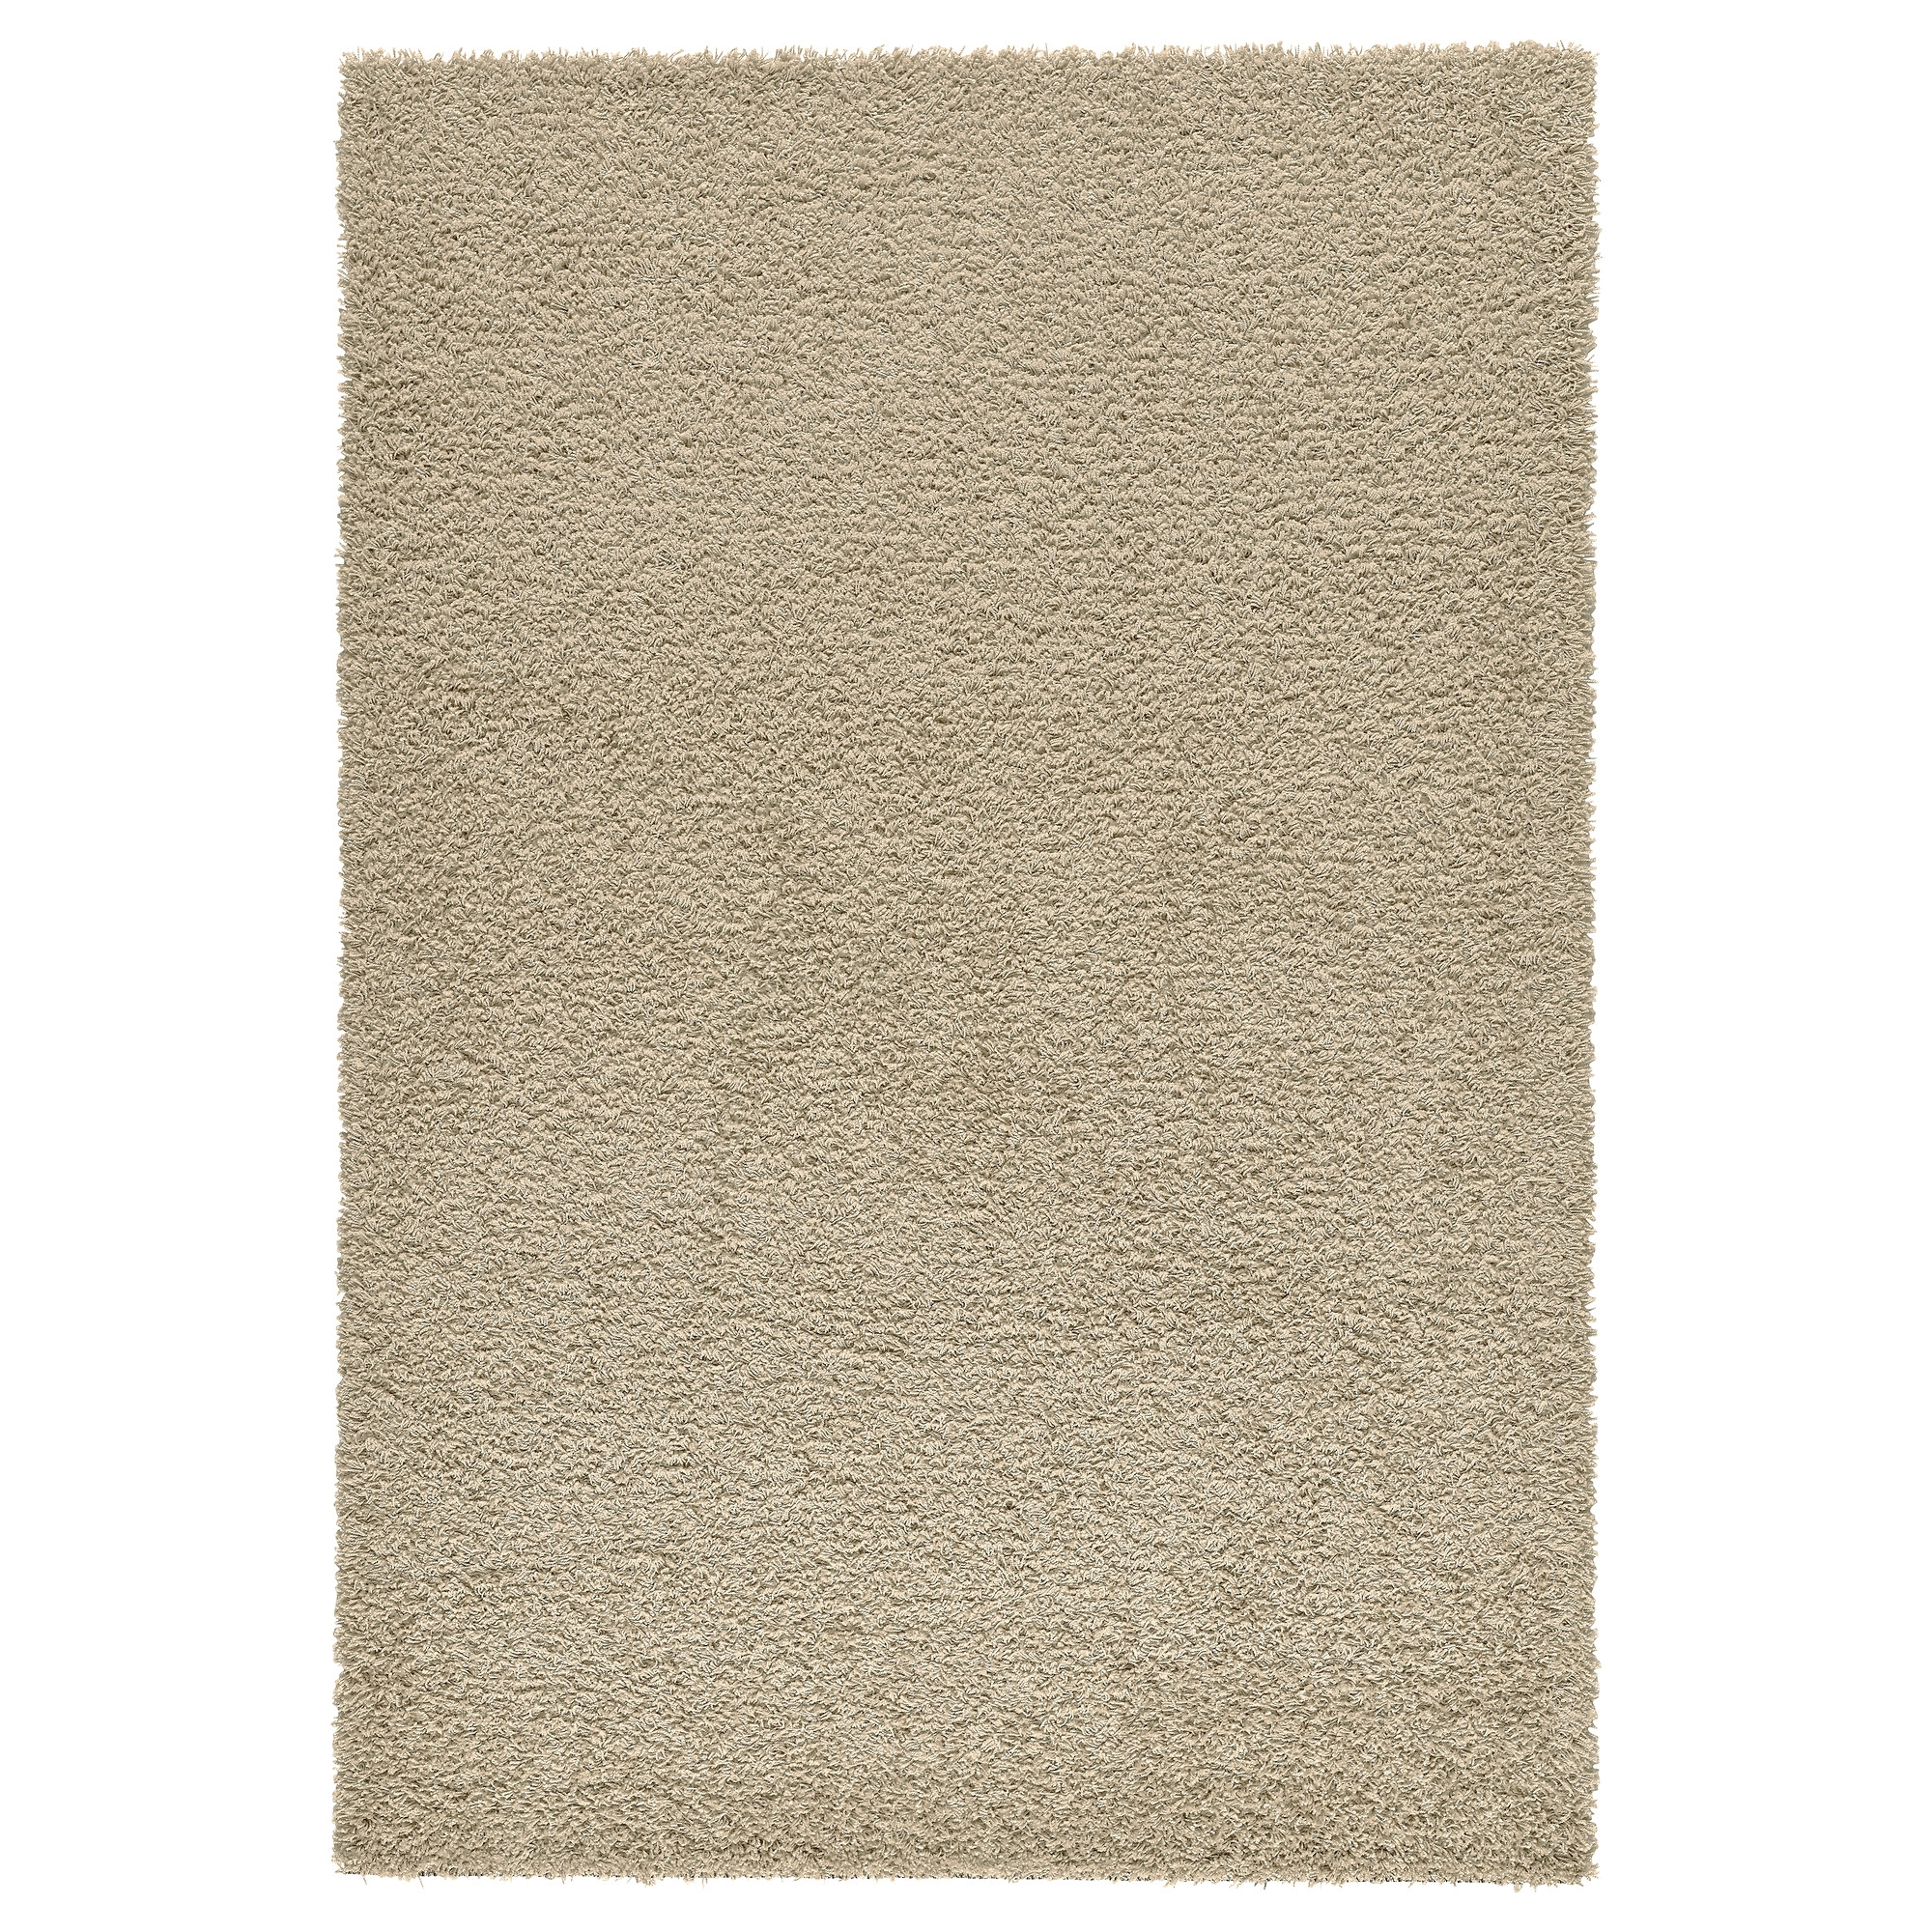 Hampen alfombra pelo largo 133x195 beige - Alfombra estrellas ikea ...